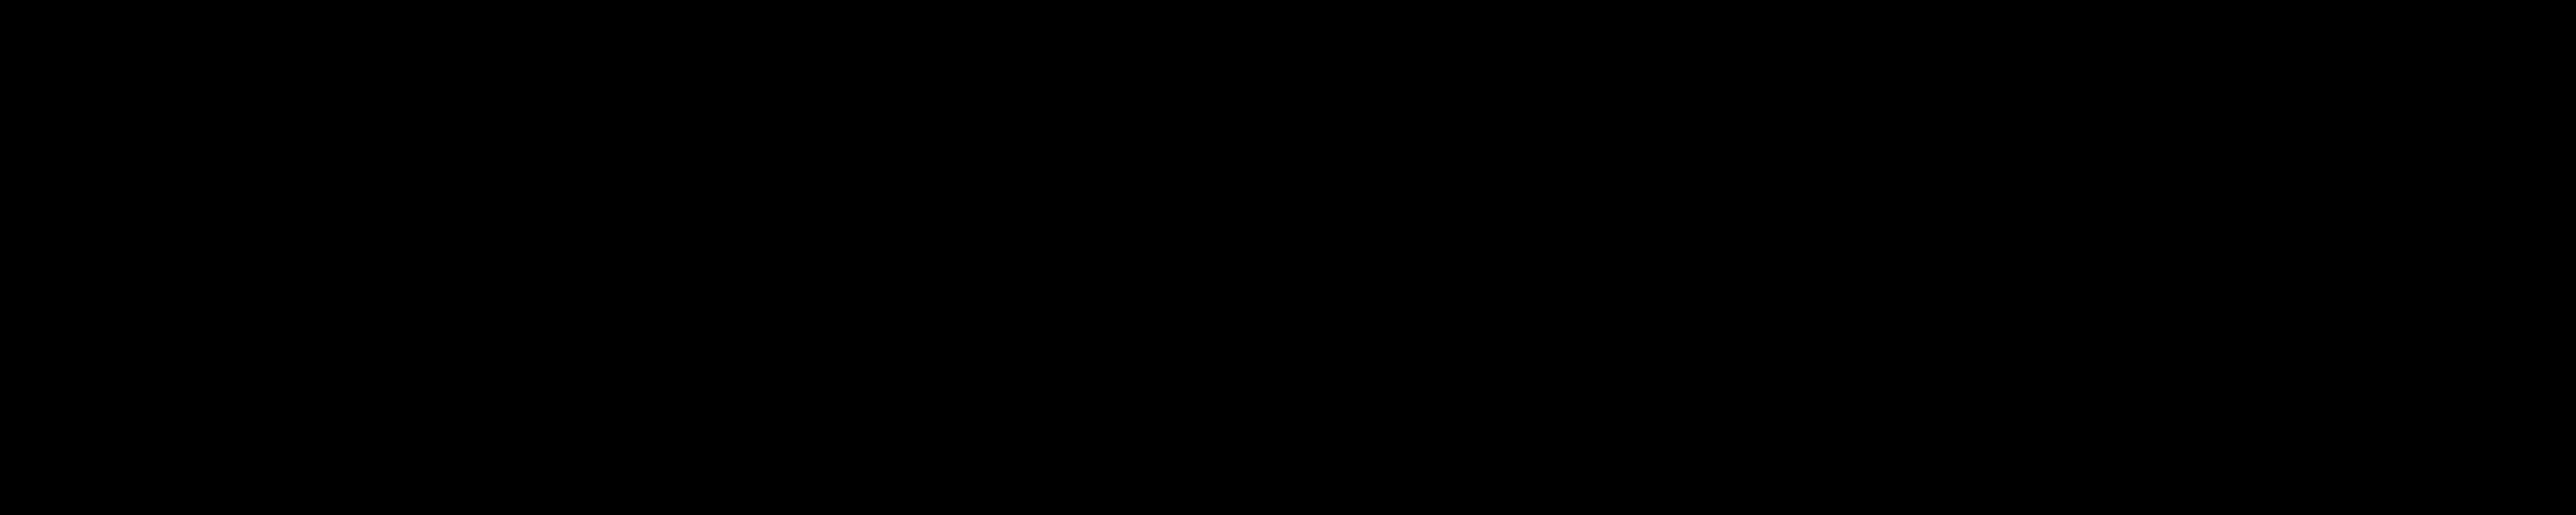 Sheekore monochrome black logo.